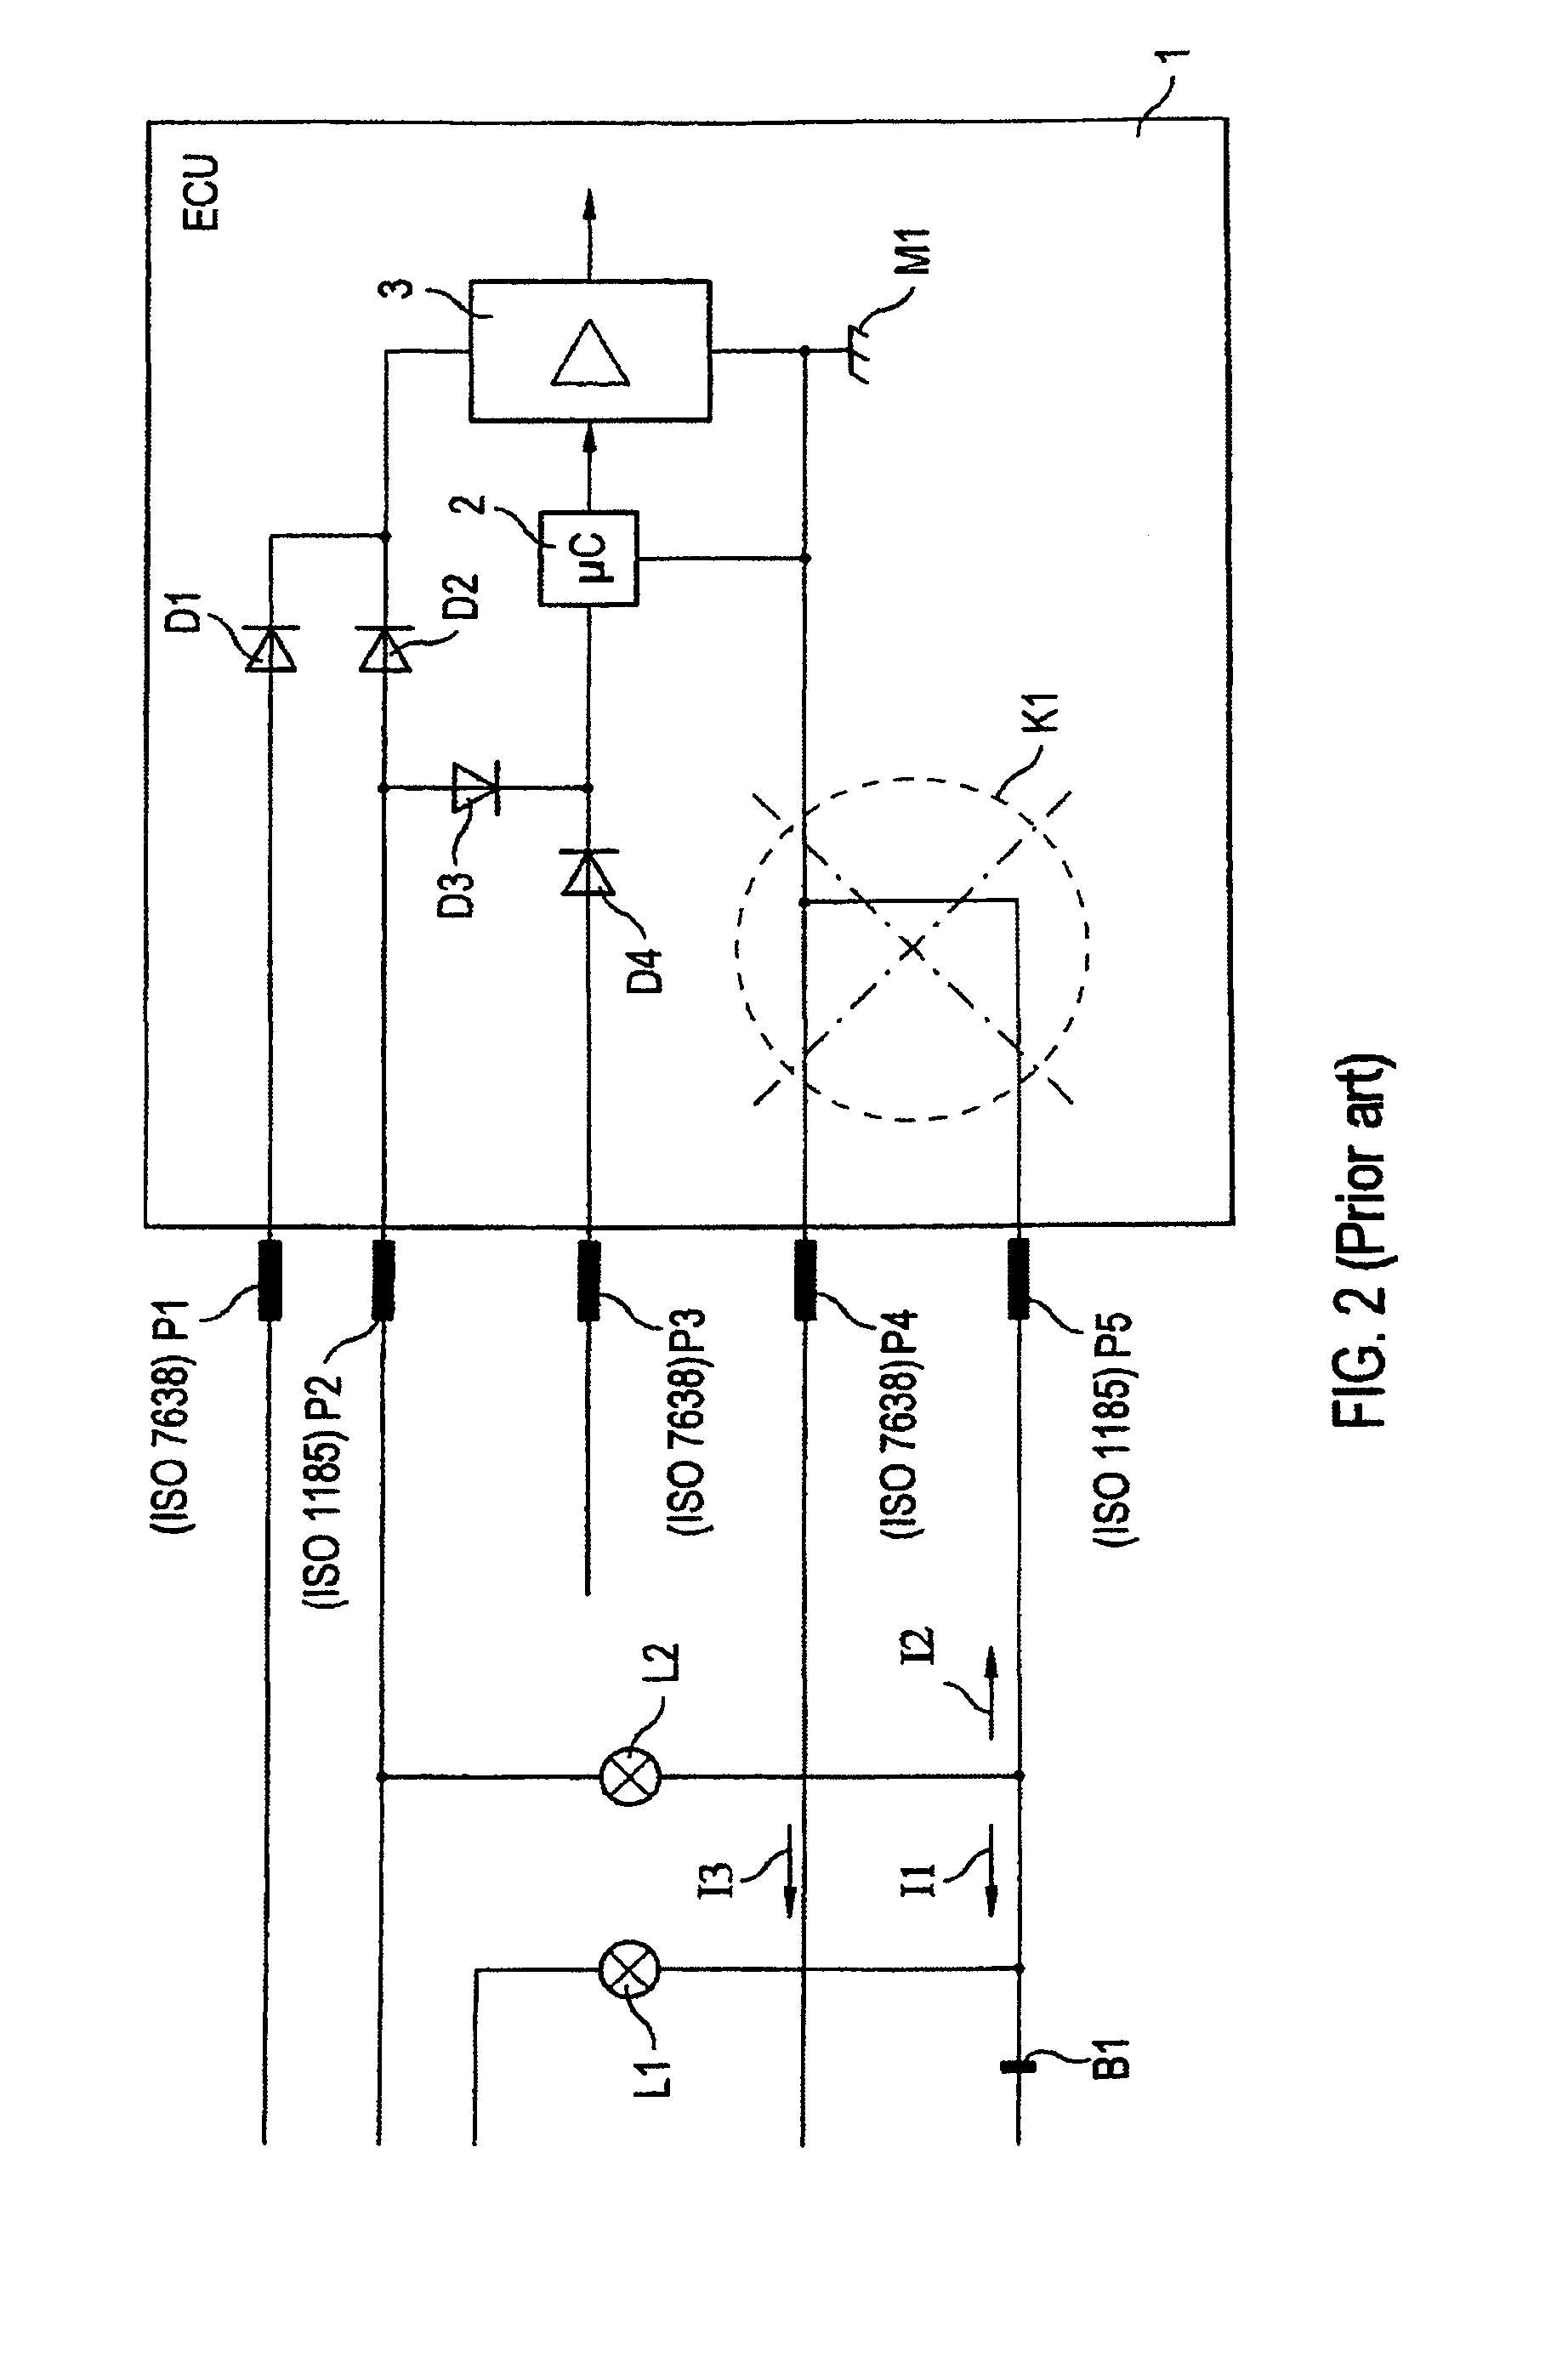 Iso Trailer Wiring Diagram Schemes Fema Books Of U2022 5 Pin Dmx